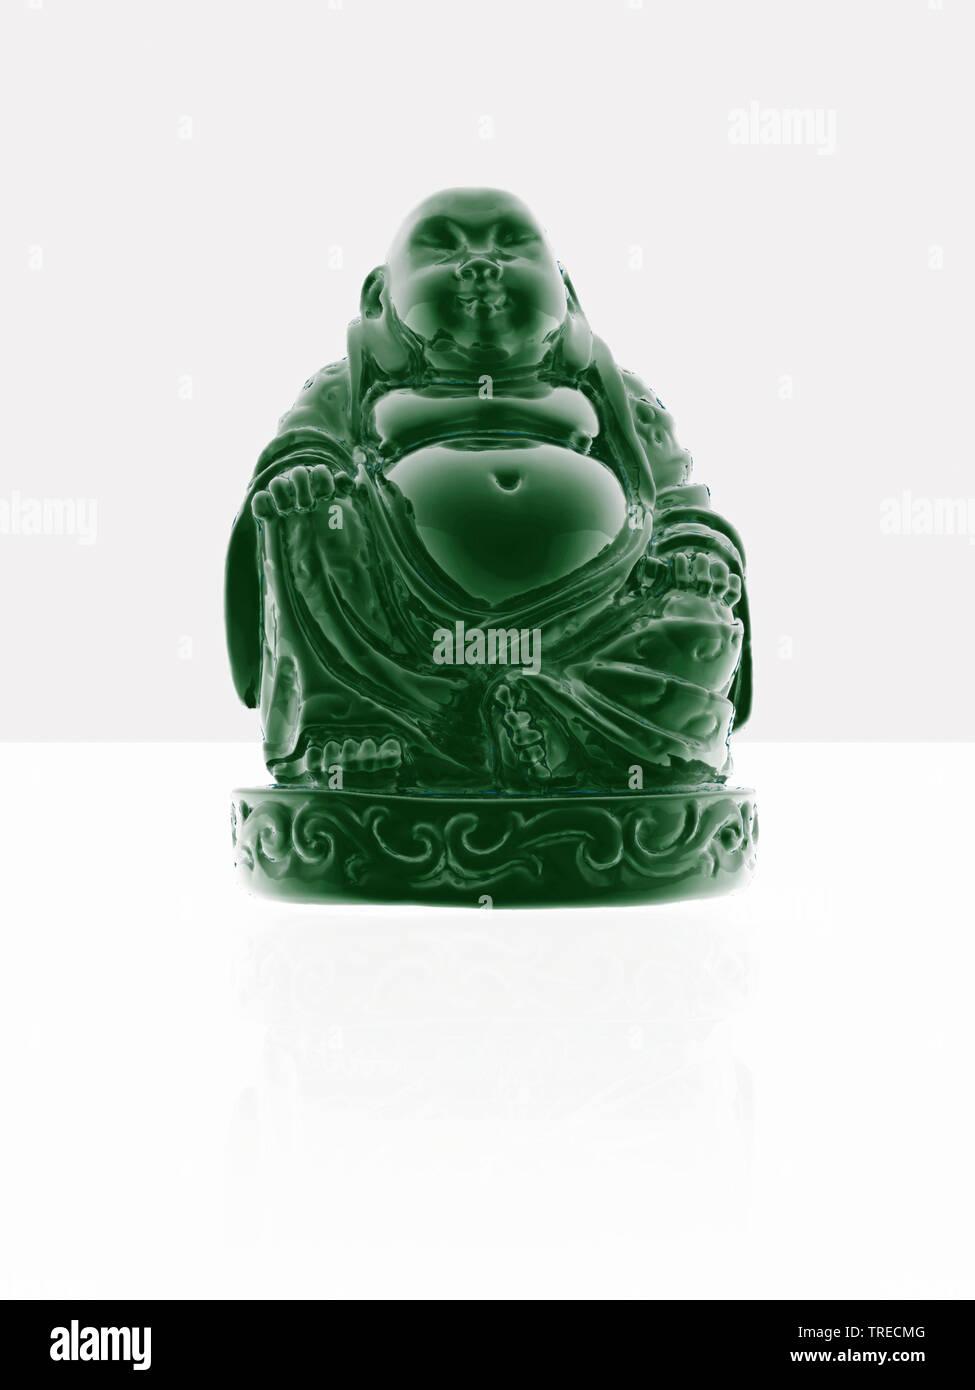 kleiner gruener Buddha aus Porzellan | sculpture green porcelain buddha | BLWS523068.jpg [ (c) blickwinkel/McPHOTO/M. Gann Tel. +49 (0)2302-2793220, E - Stock Image